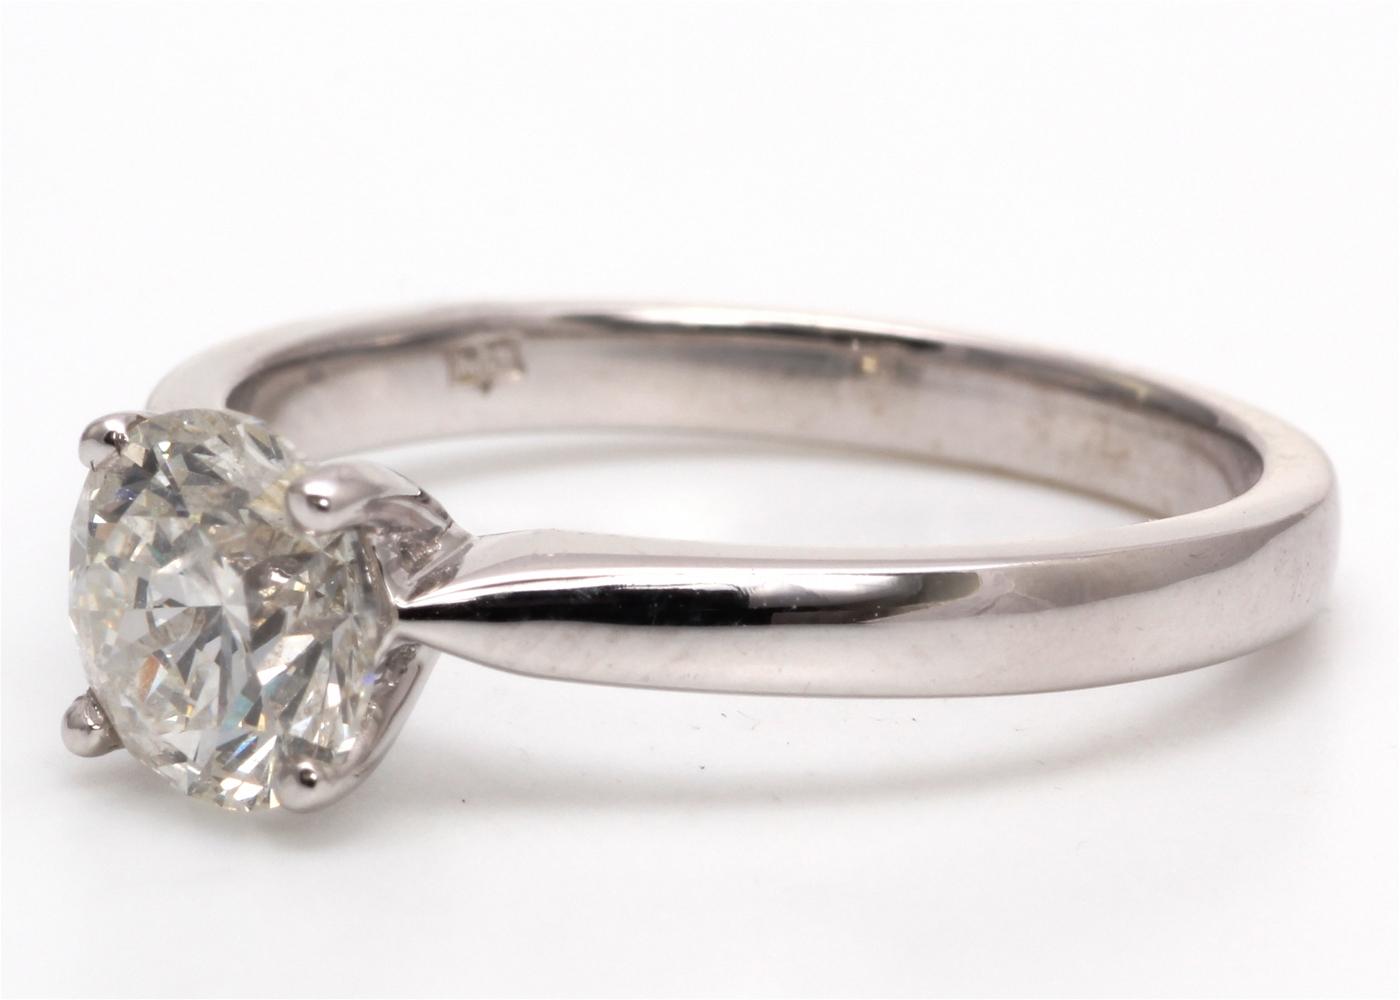 18ct White Gold Single Stone Diamond Ring 1.05 Carats - Image 2 of 4